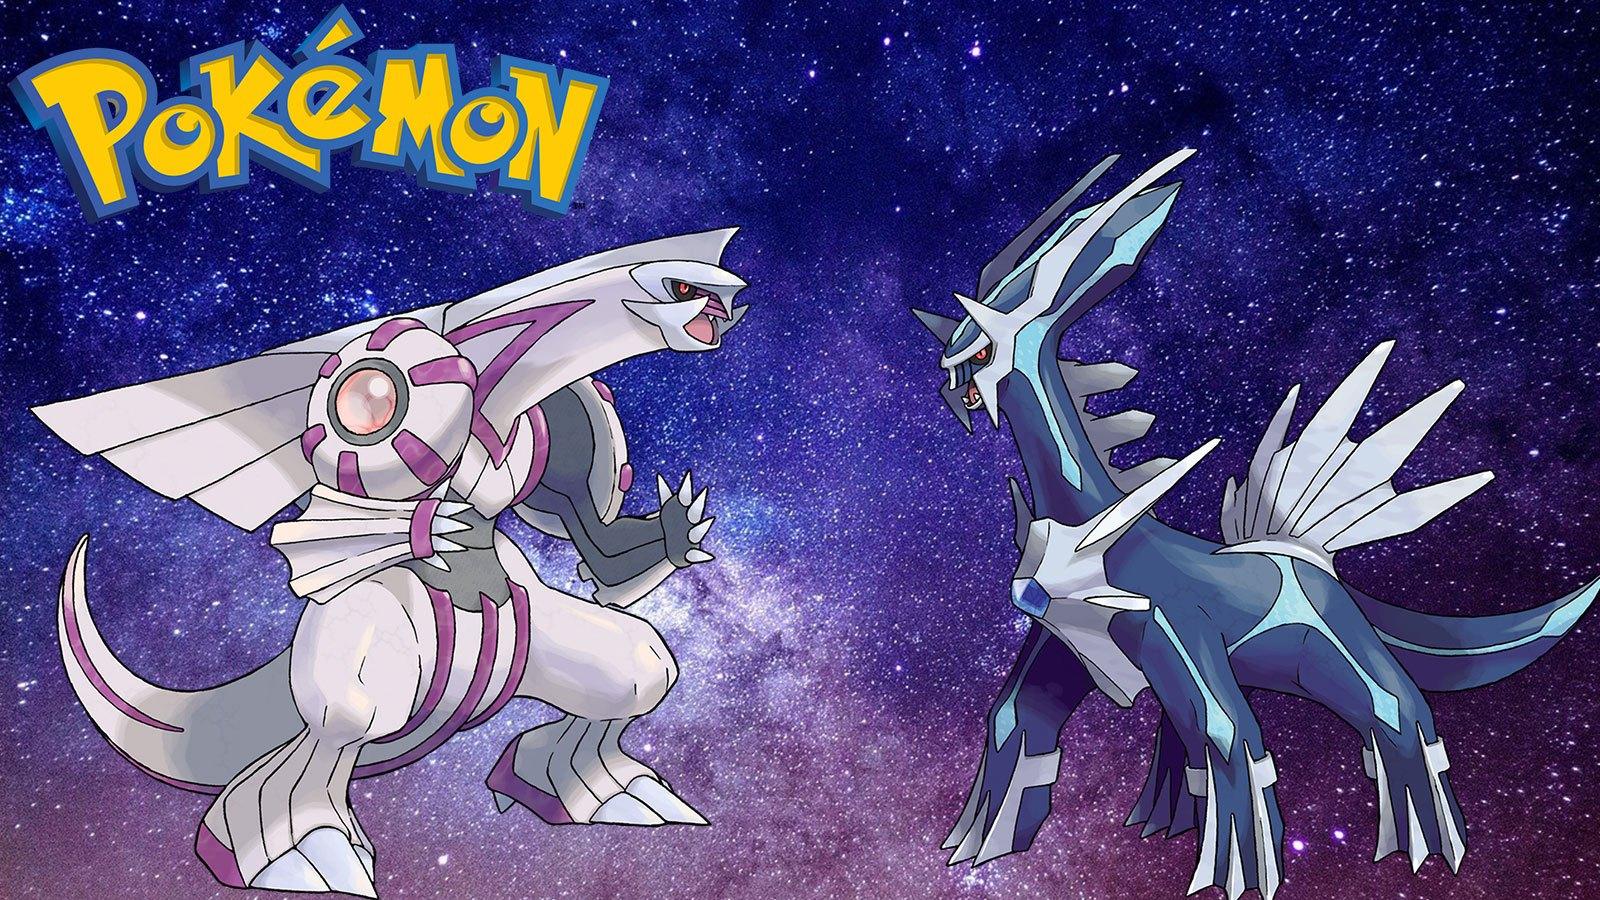 Pokémon Dialga Palkia